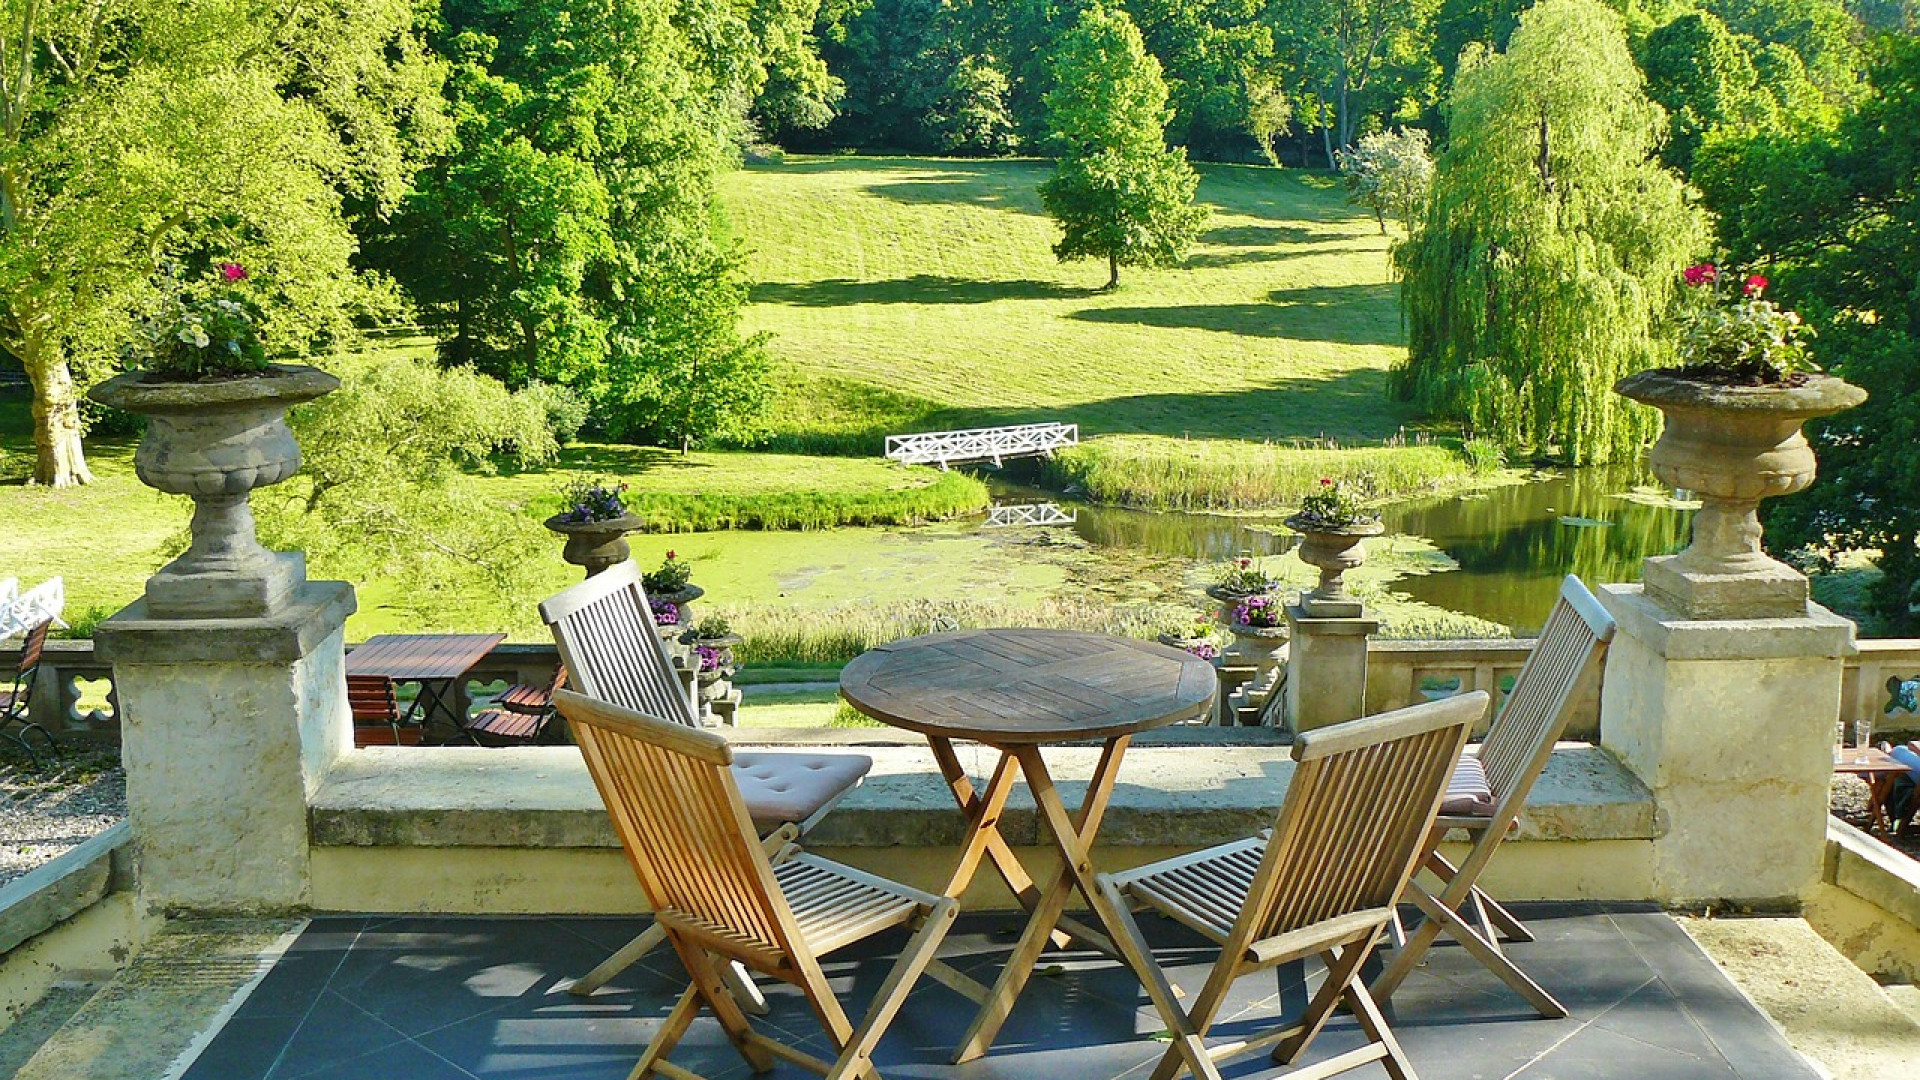 Bien choisir son salon de jardin design